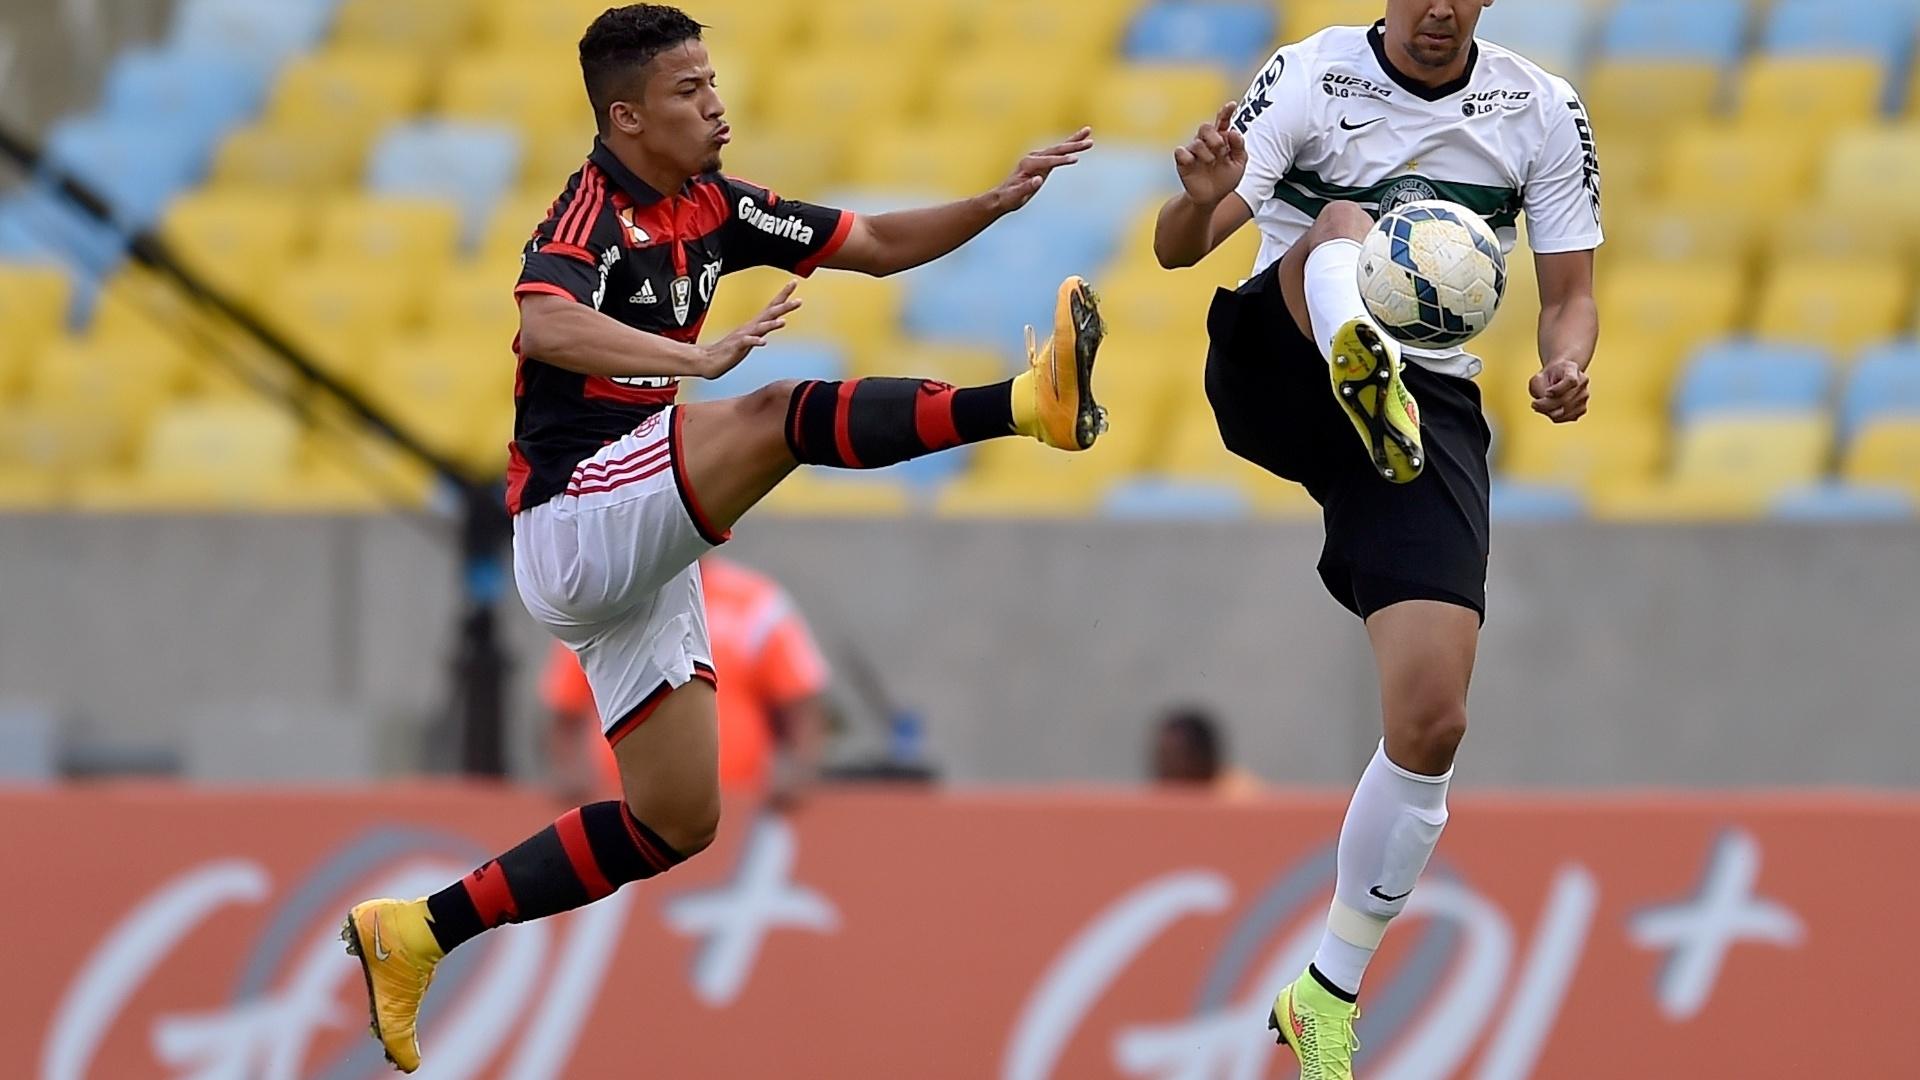 Nixon e Leandro Almeida disputam bola na partida entre Flamengo e Coritiba